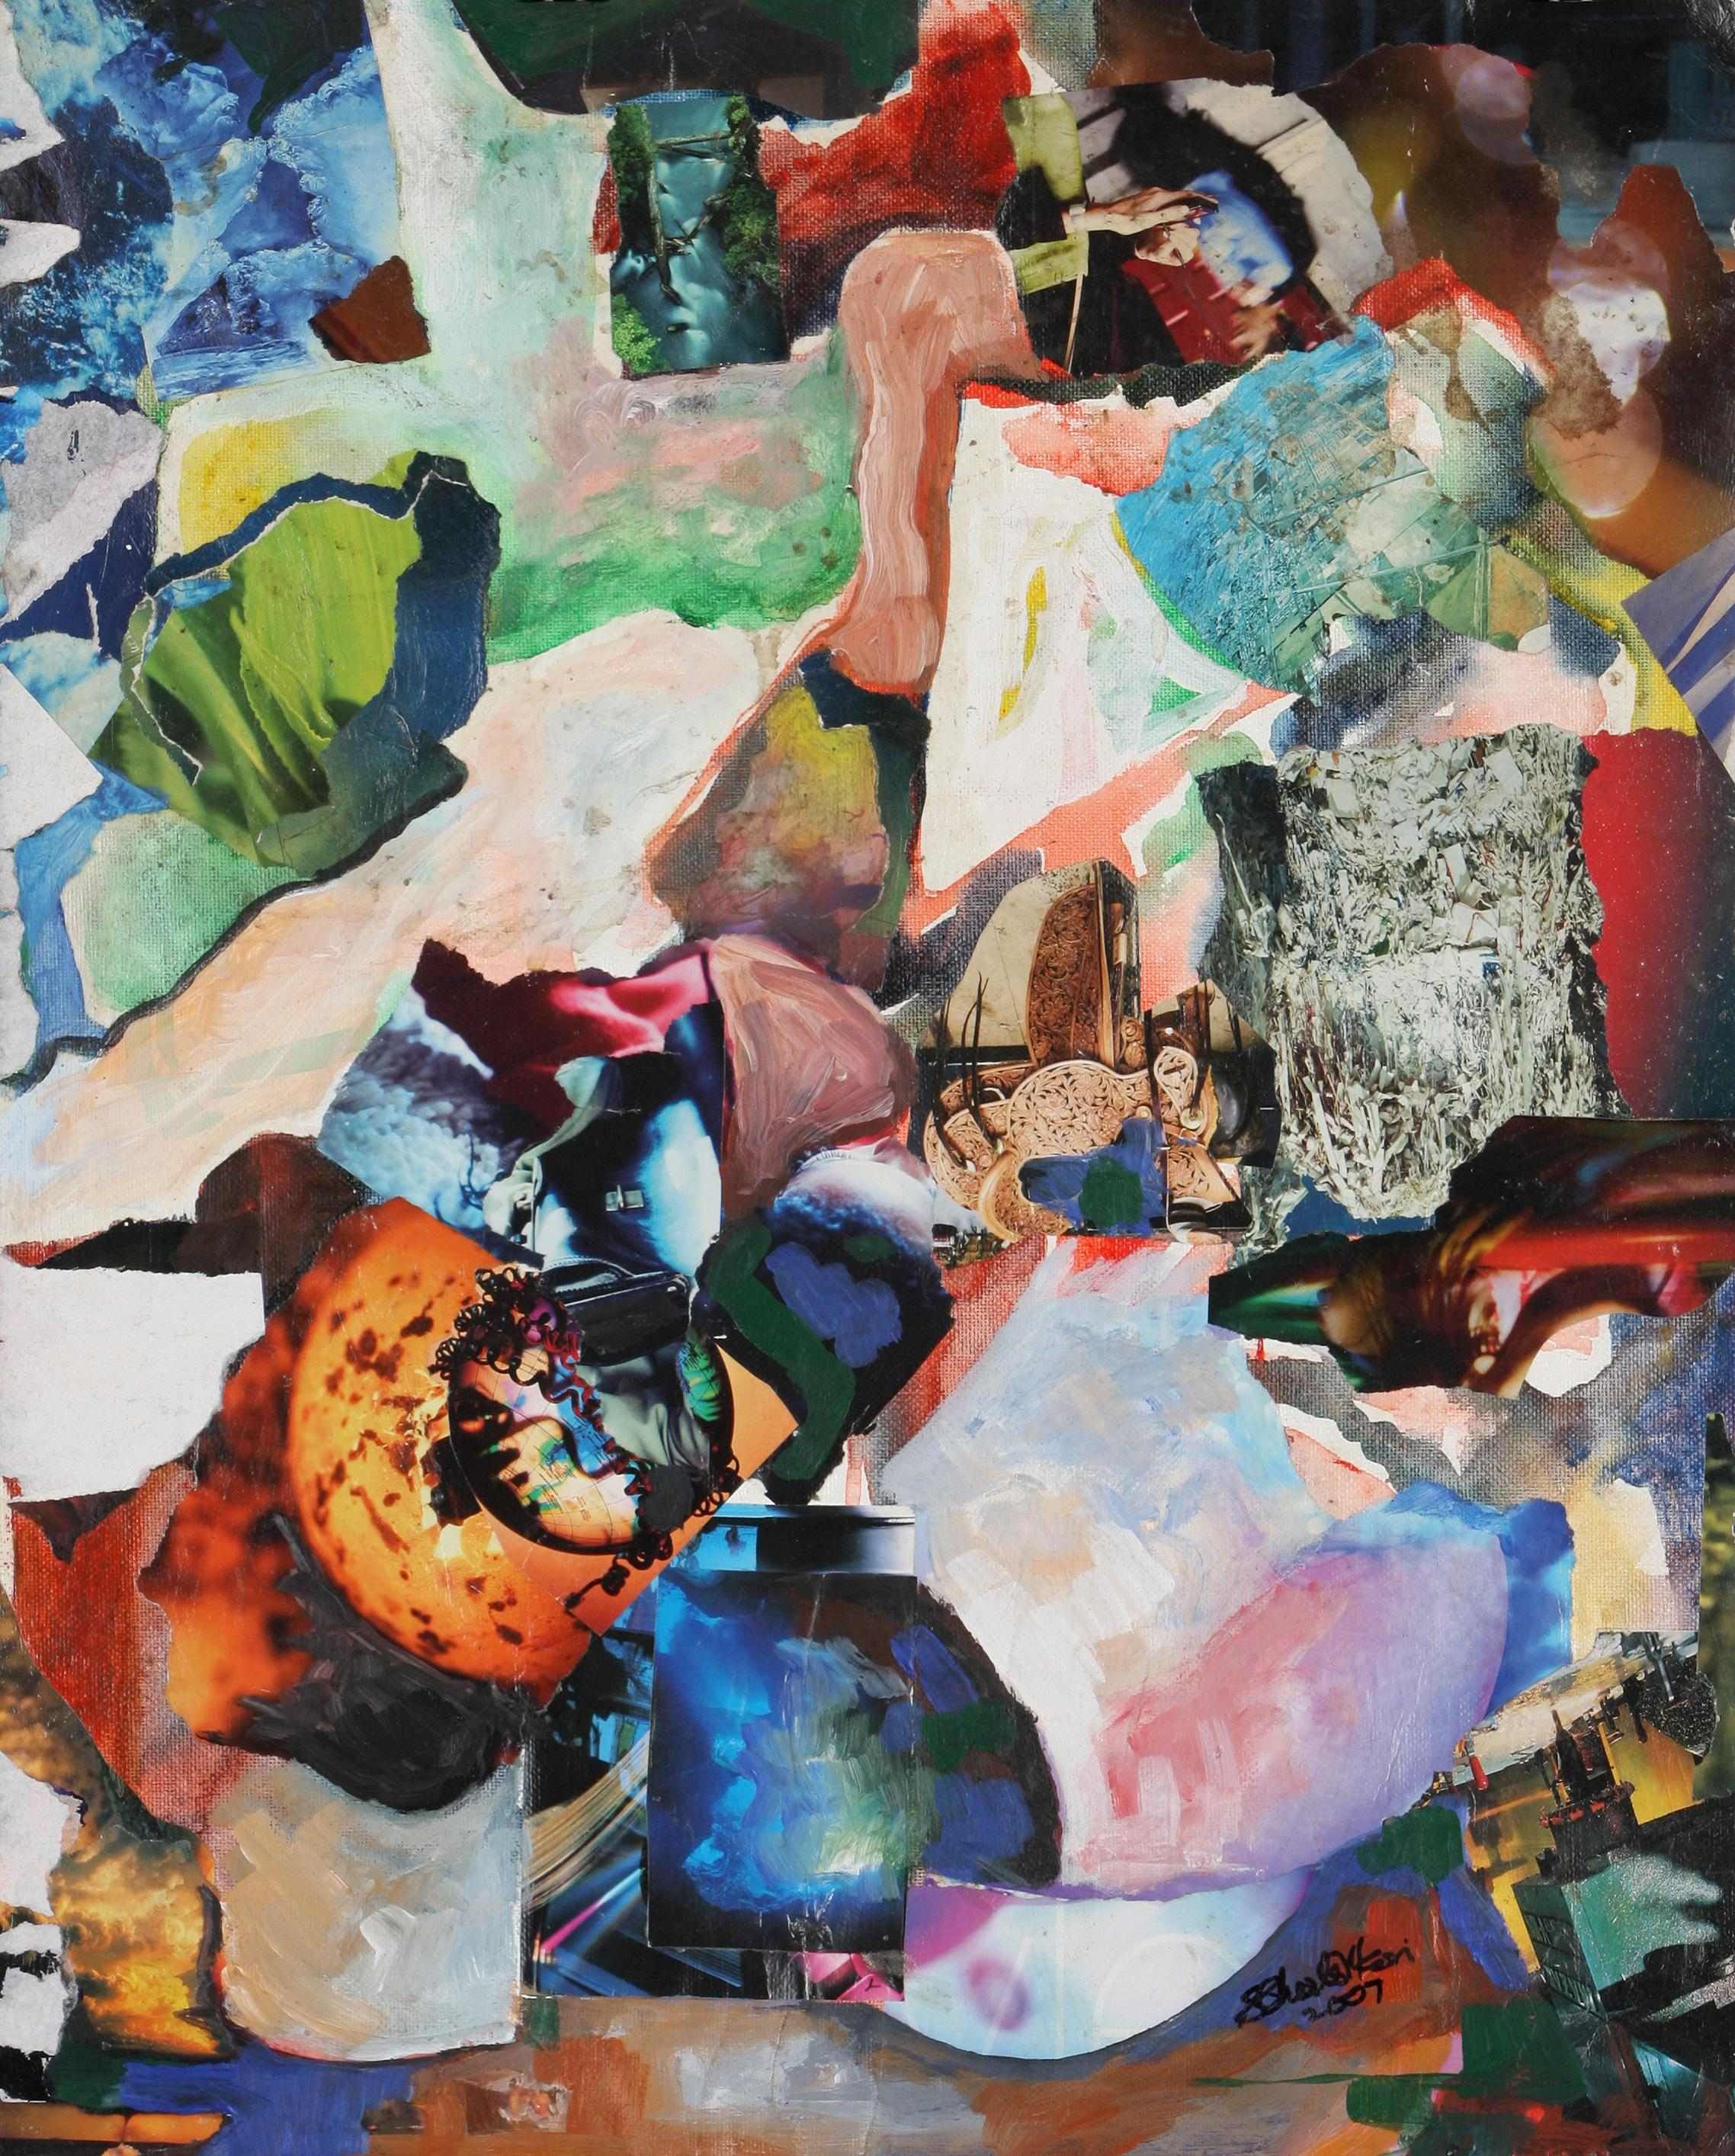 Charles Nkosi (South Africa 1949-) A Stitch in Time (Umathunga), 2017